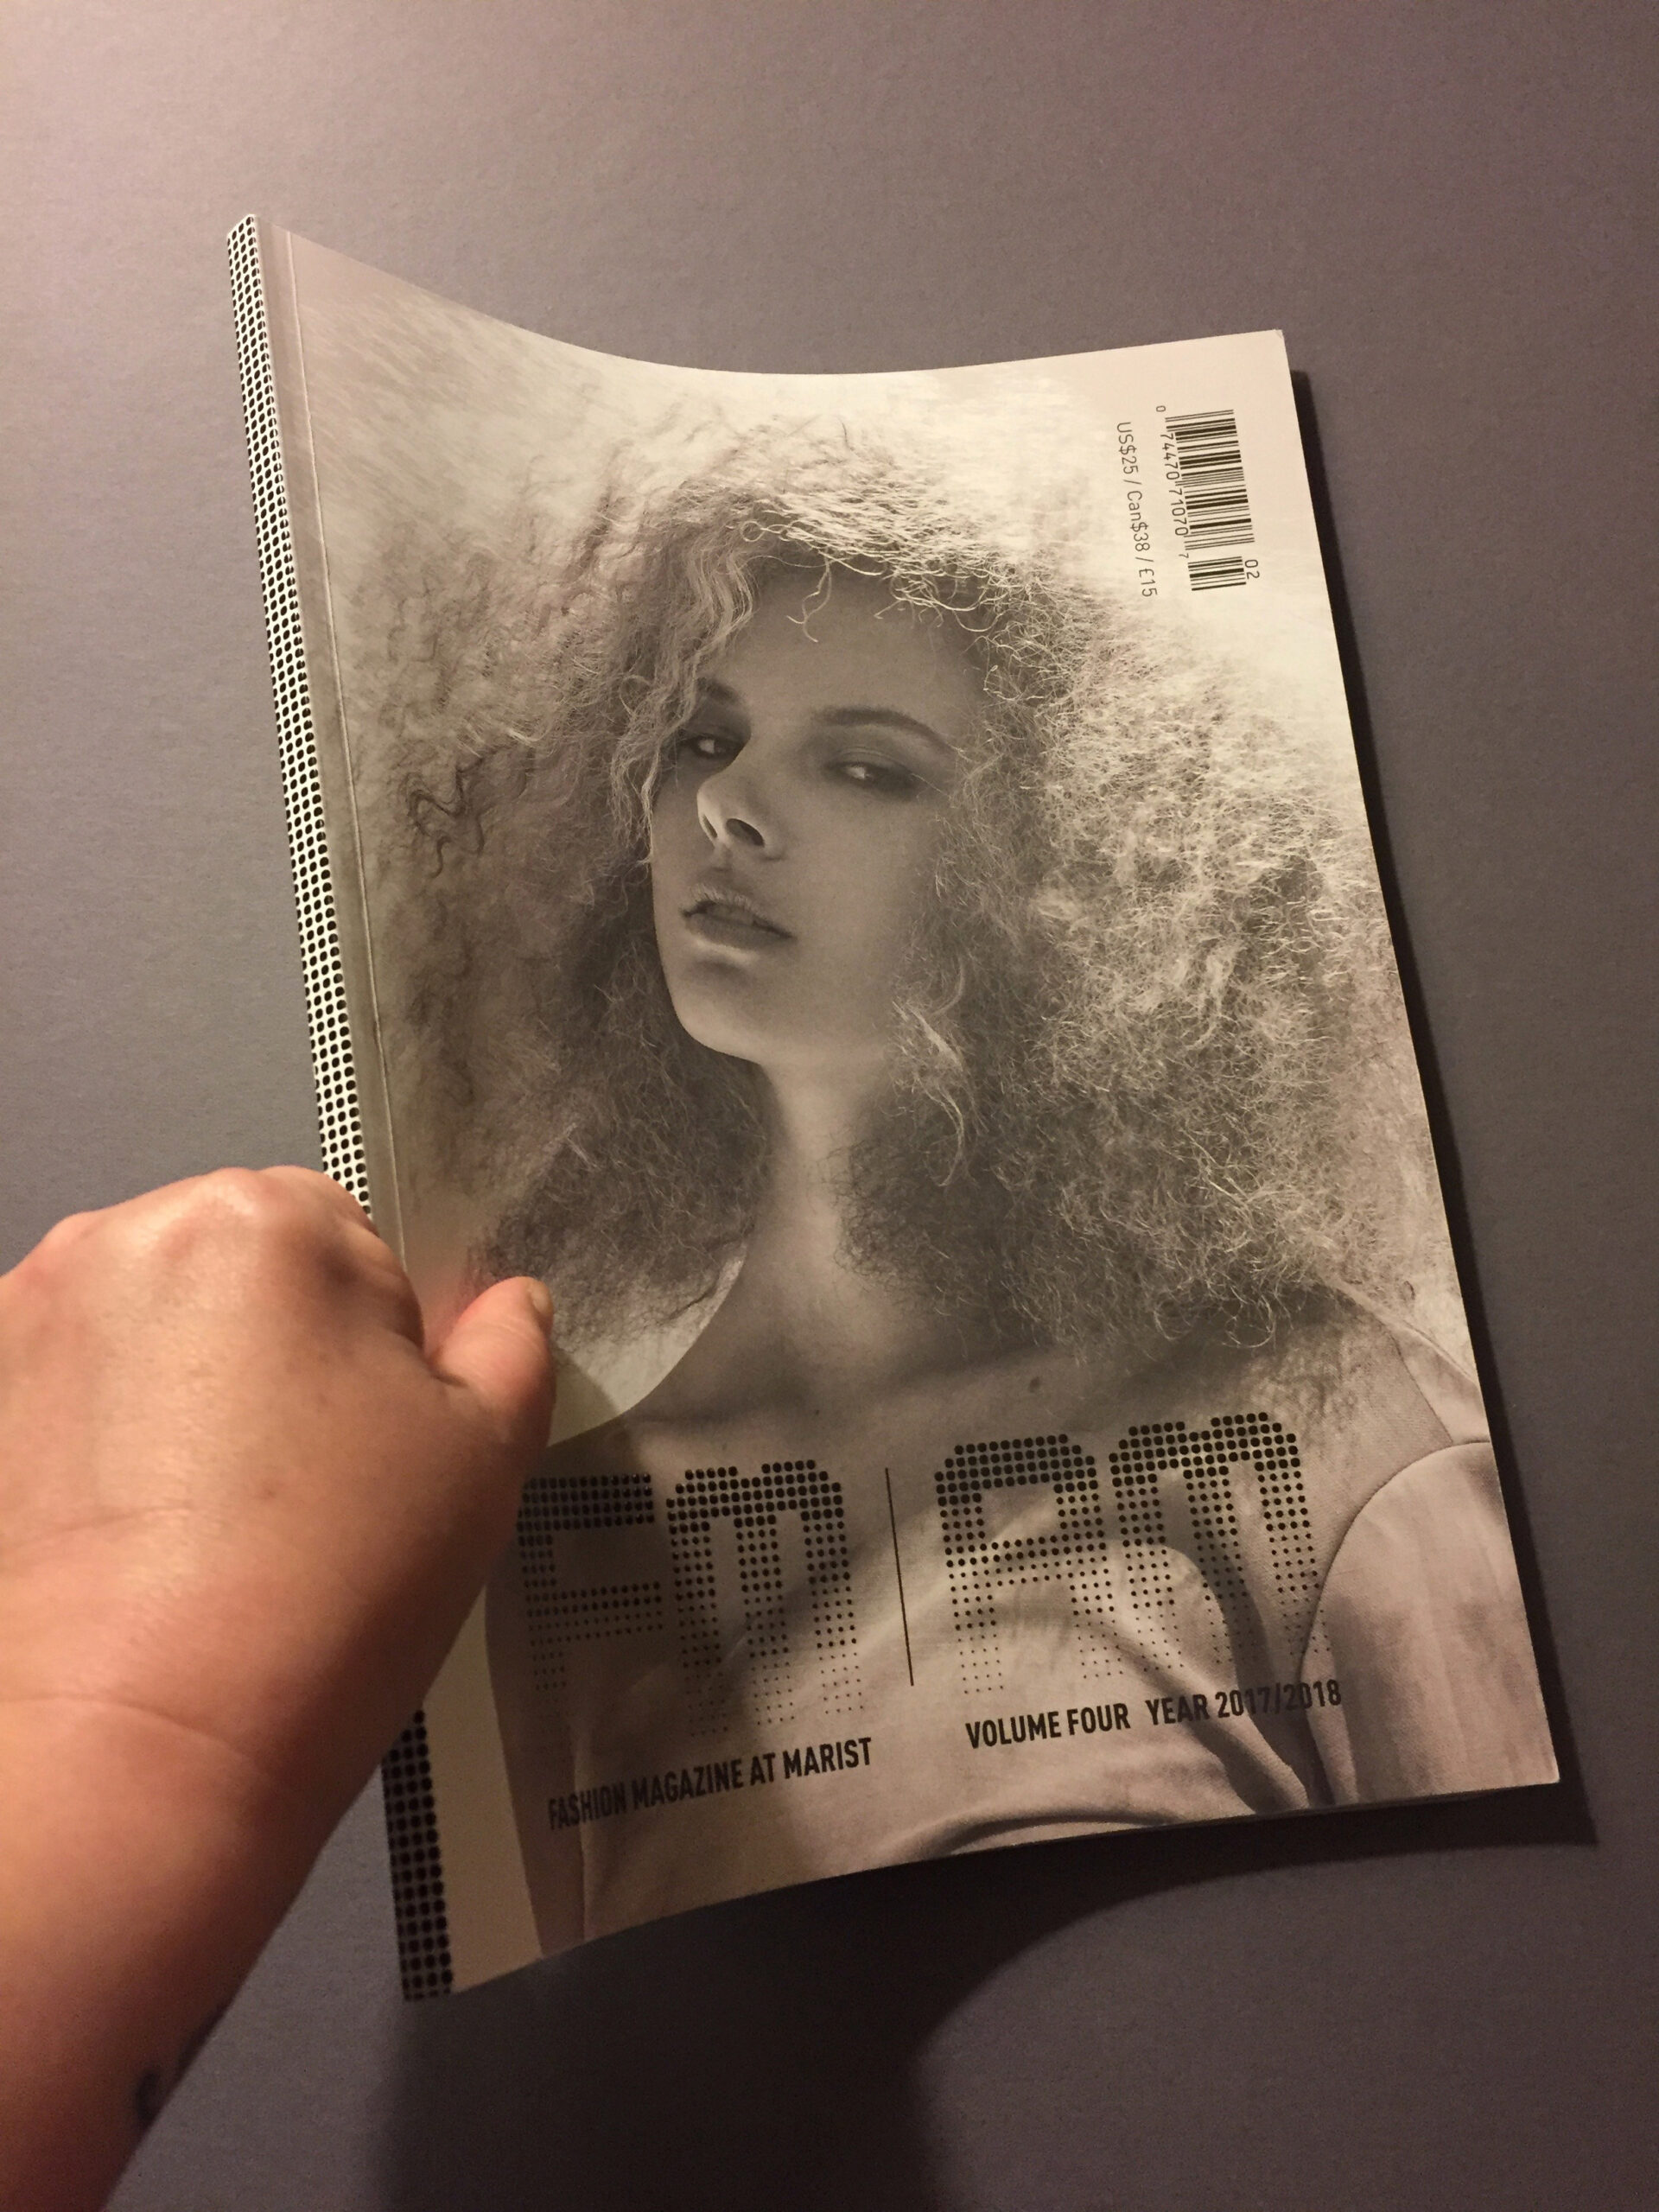 fm am vol 4 cover